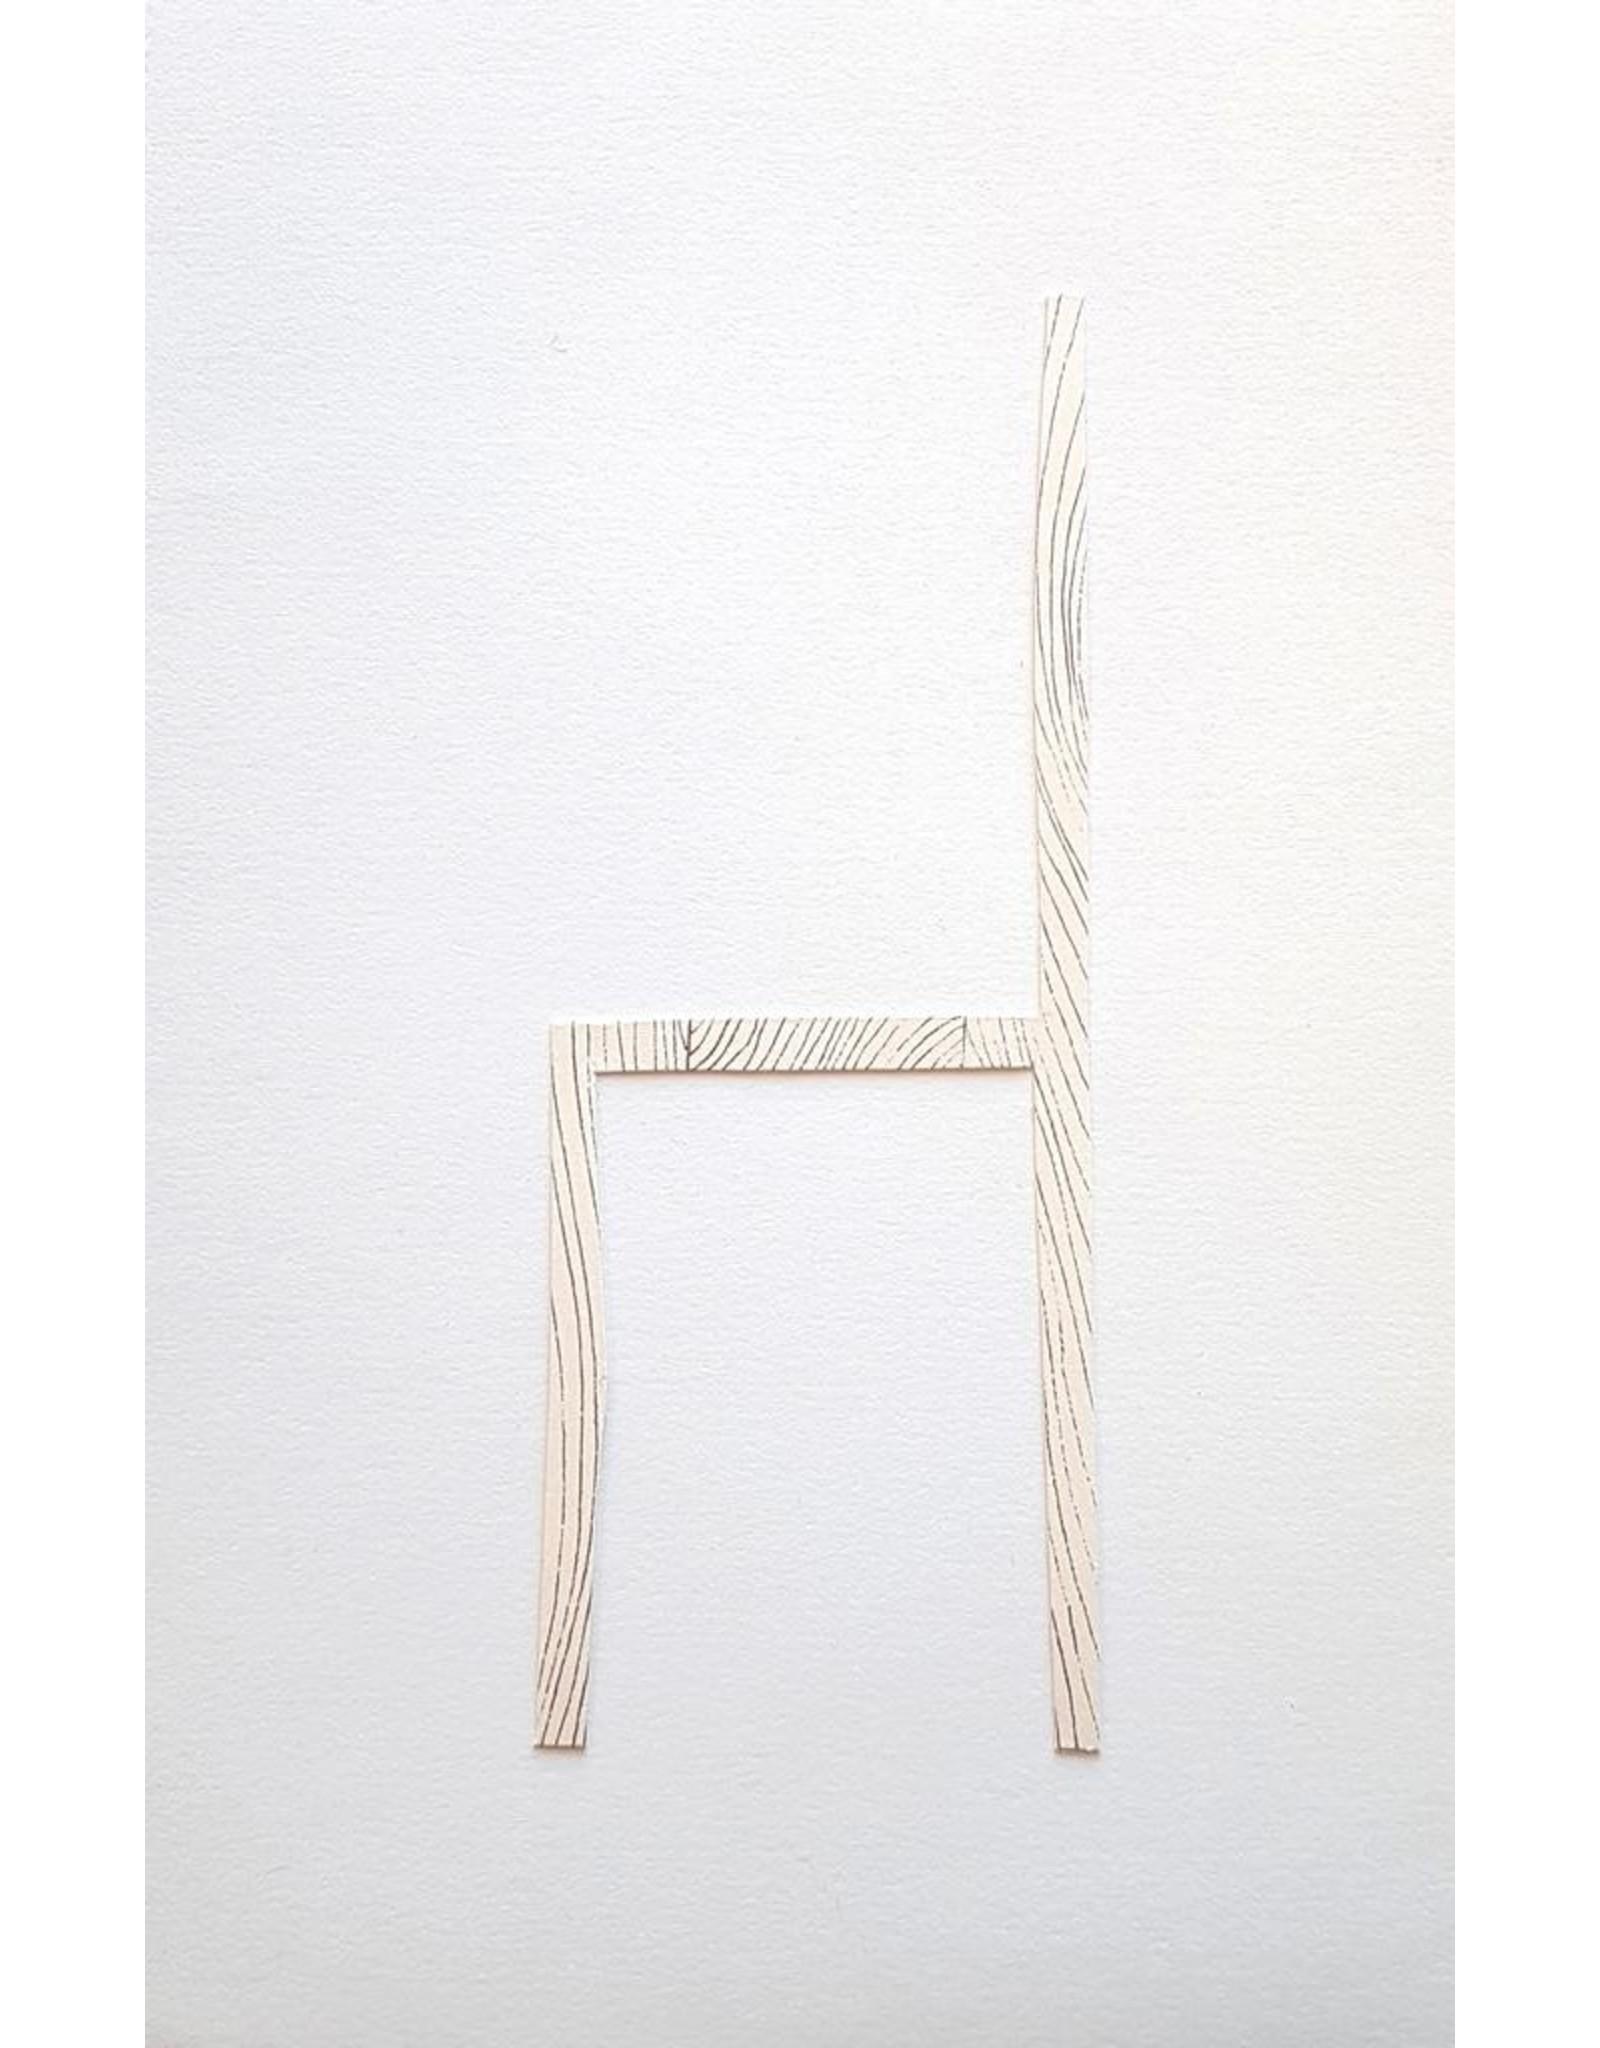 Josephson-Laidlaw, Erin Chair, Erin Josephson-Laidlaw